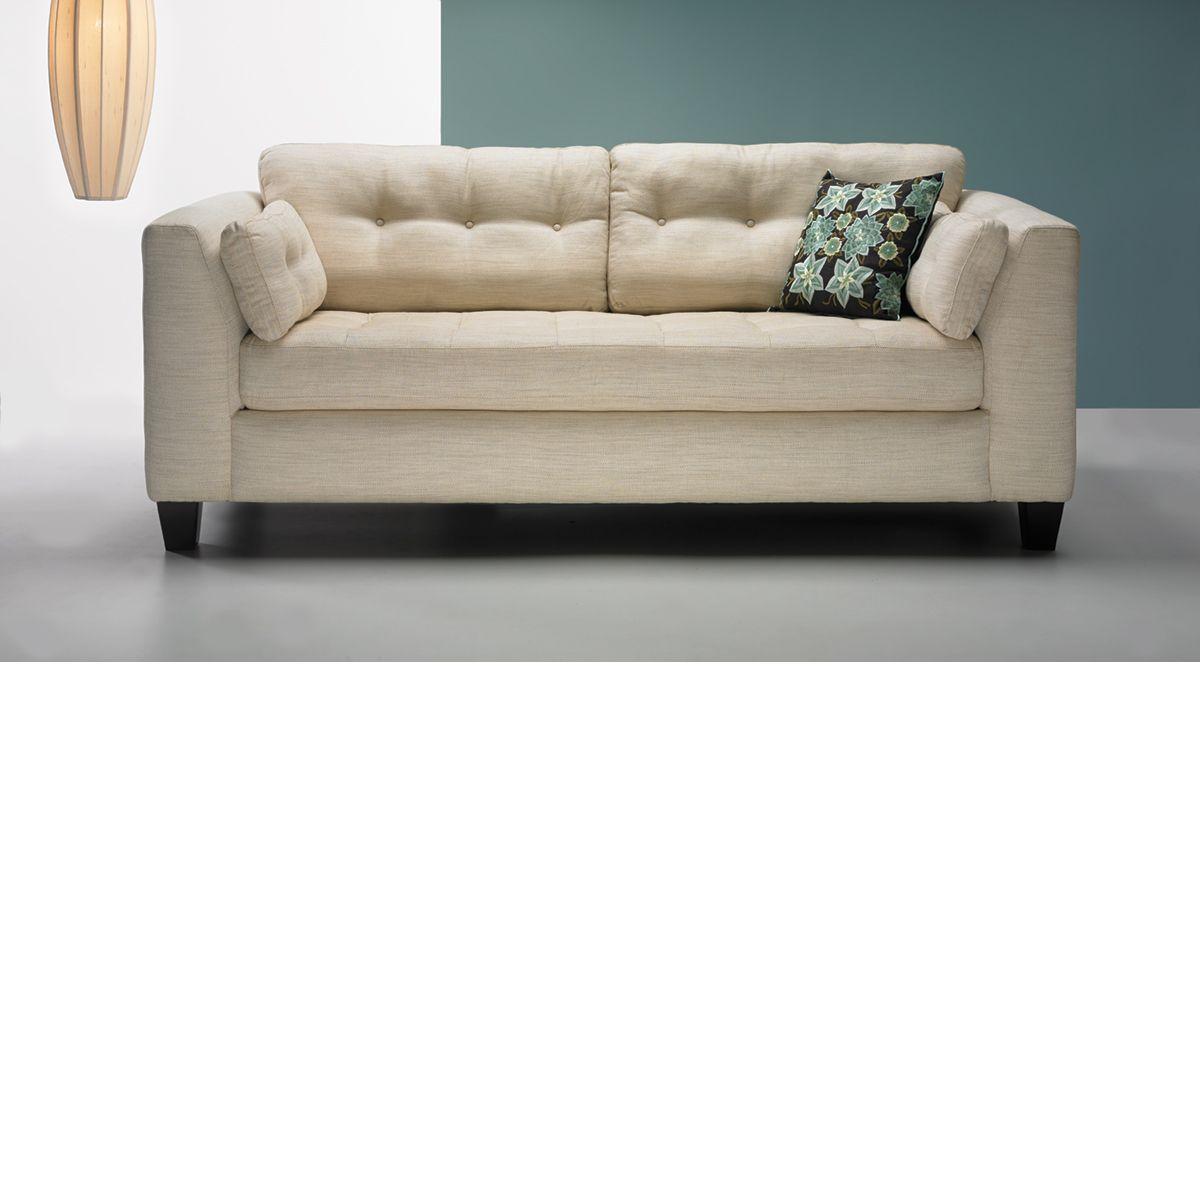 The Dump Furniture - MARLOW SOFA   Furniture   Pinterest   Dump ...